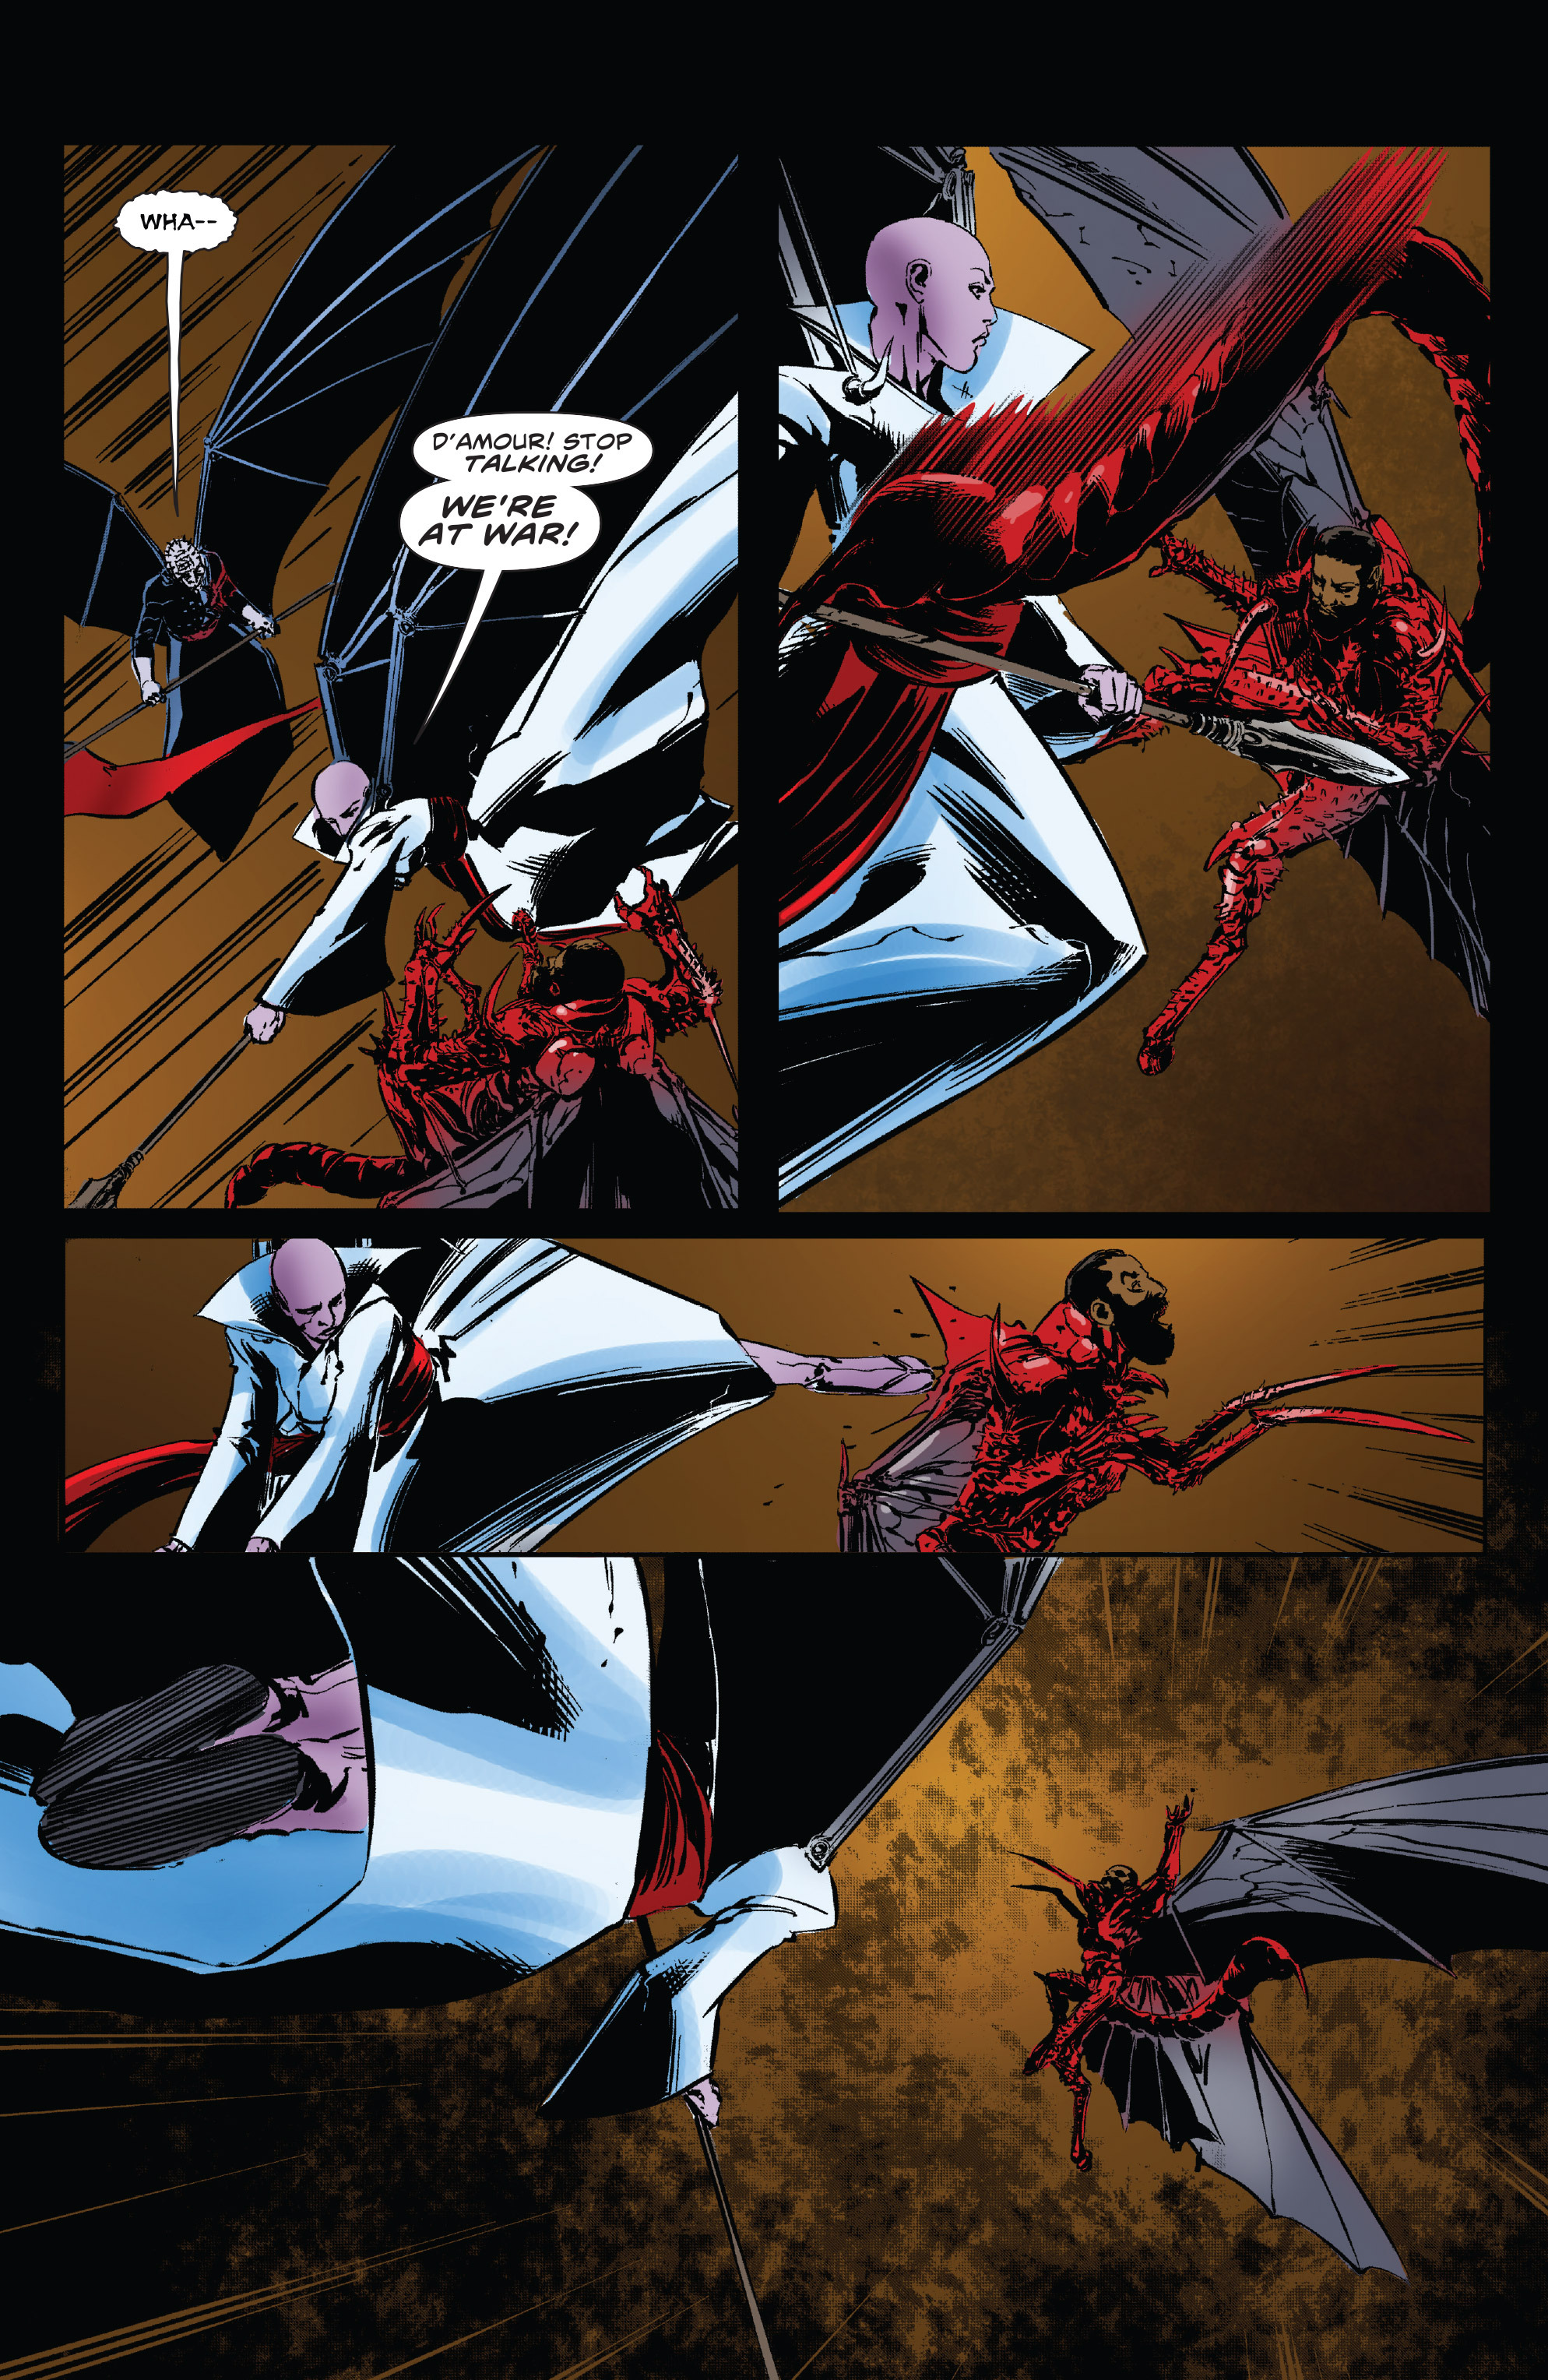 Read online Clive Barker's Hellraiser: The Dark Watch comic -  Issue # TPB 3 - 69